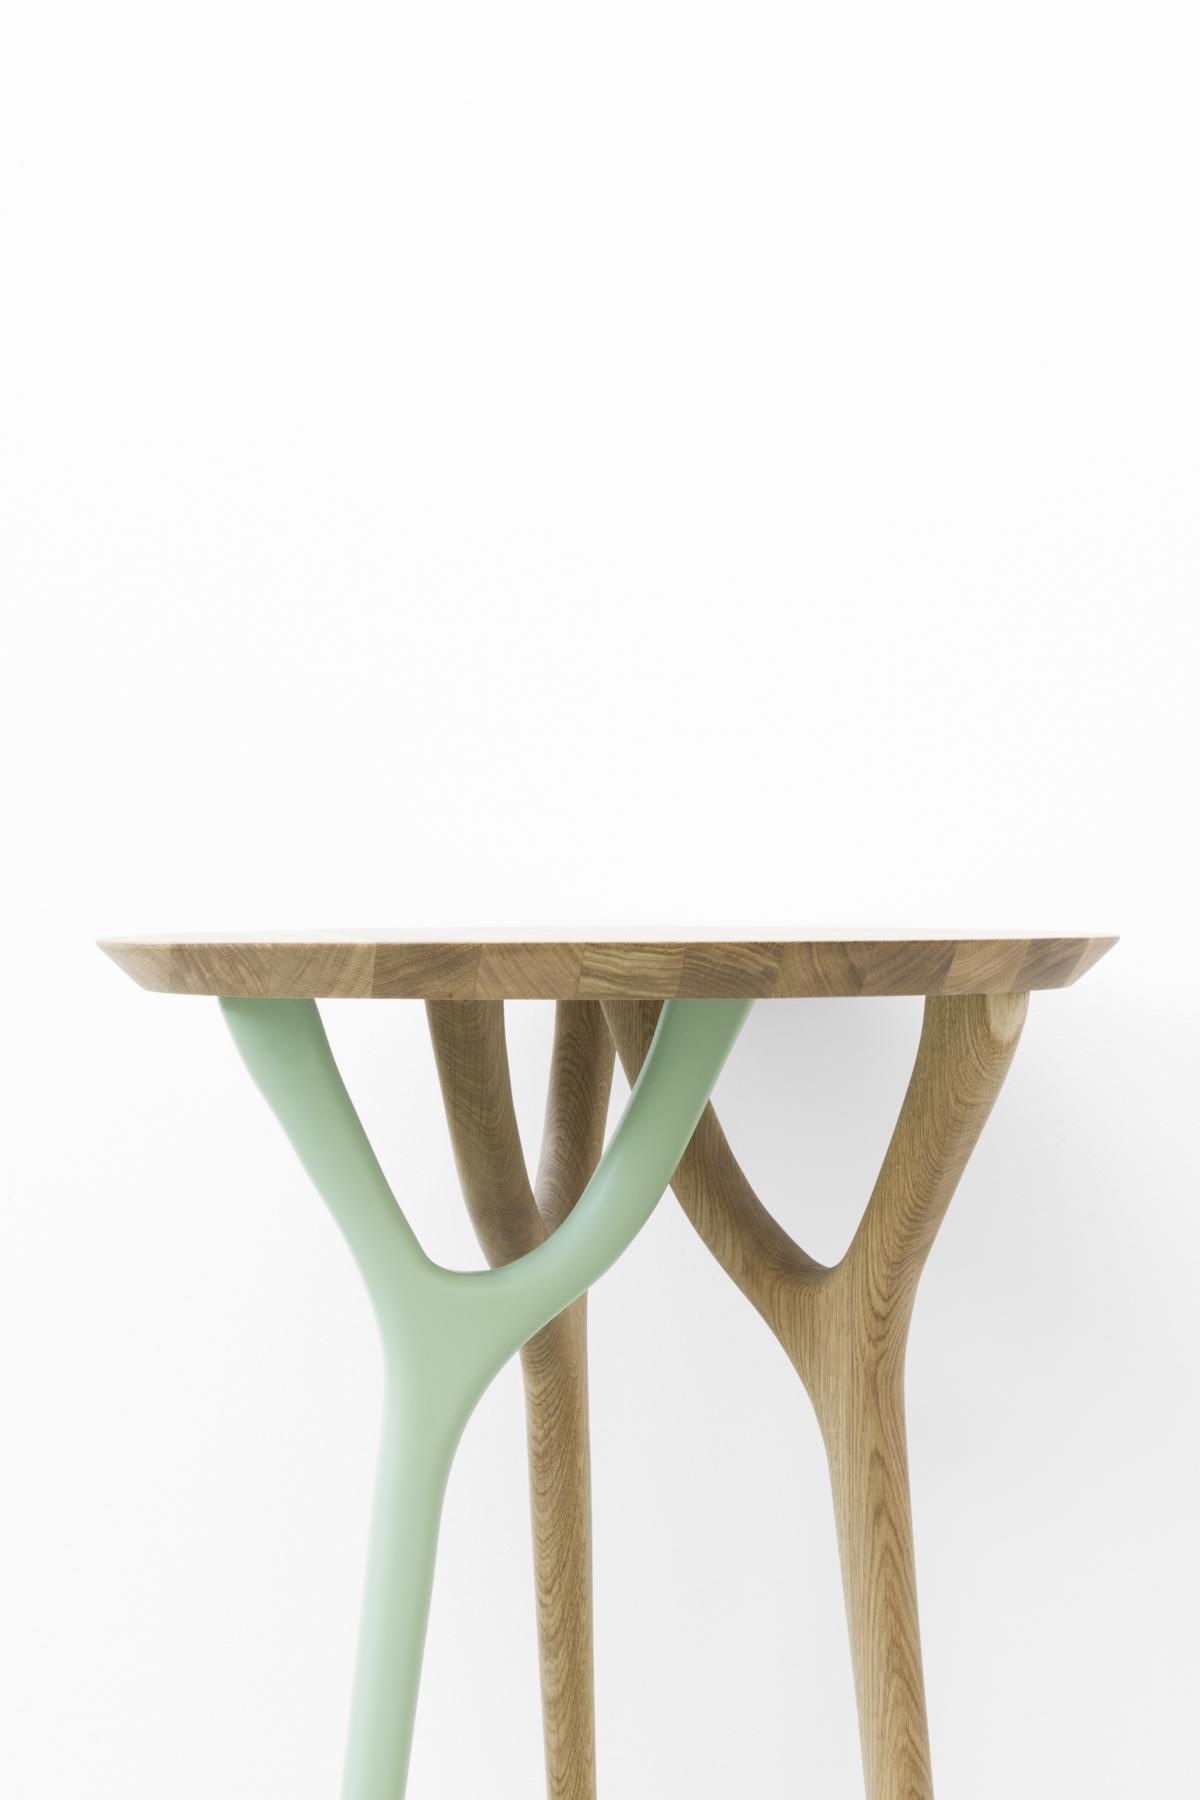 Vegetable collection design Vito Nesta Cadriano 05